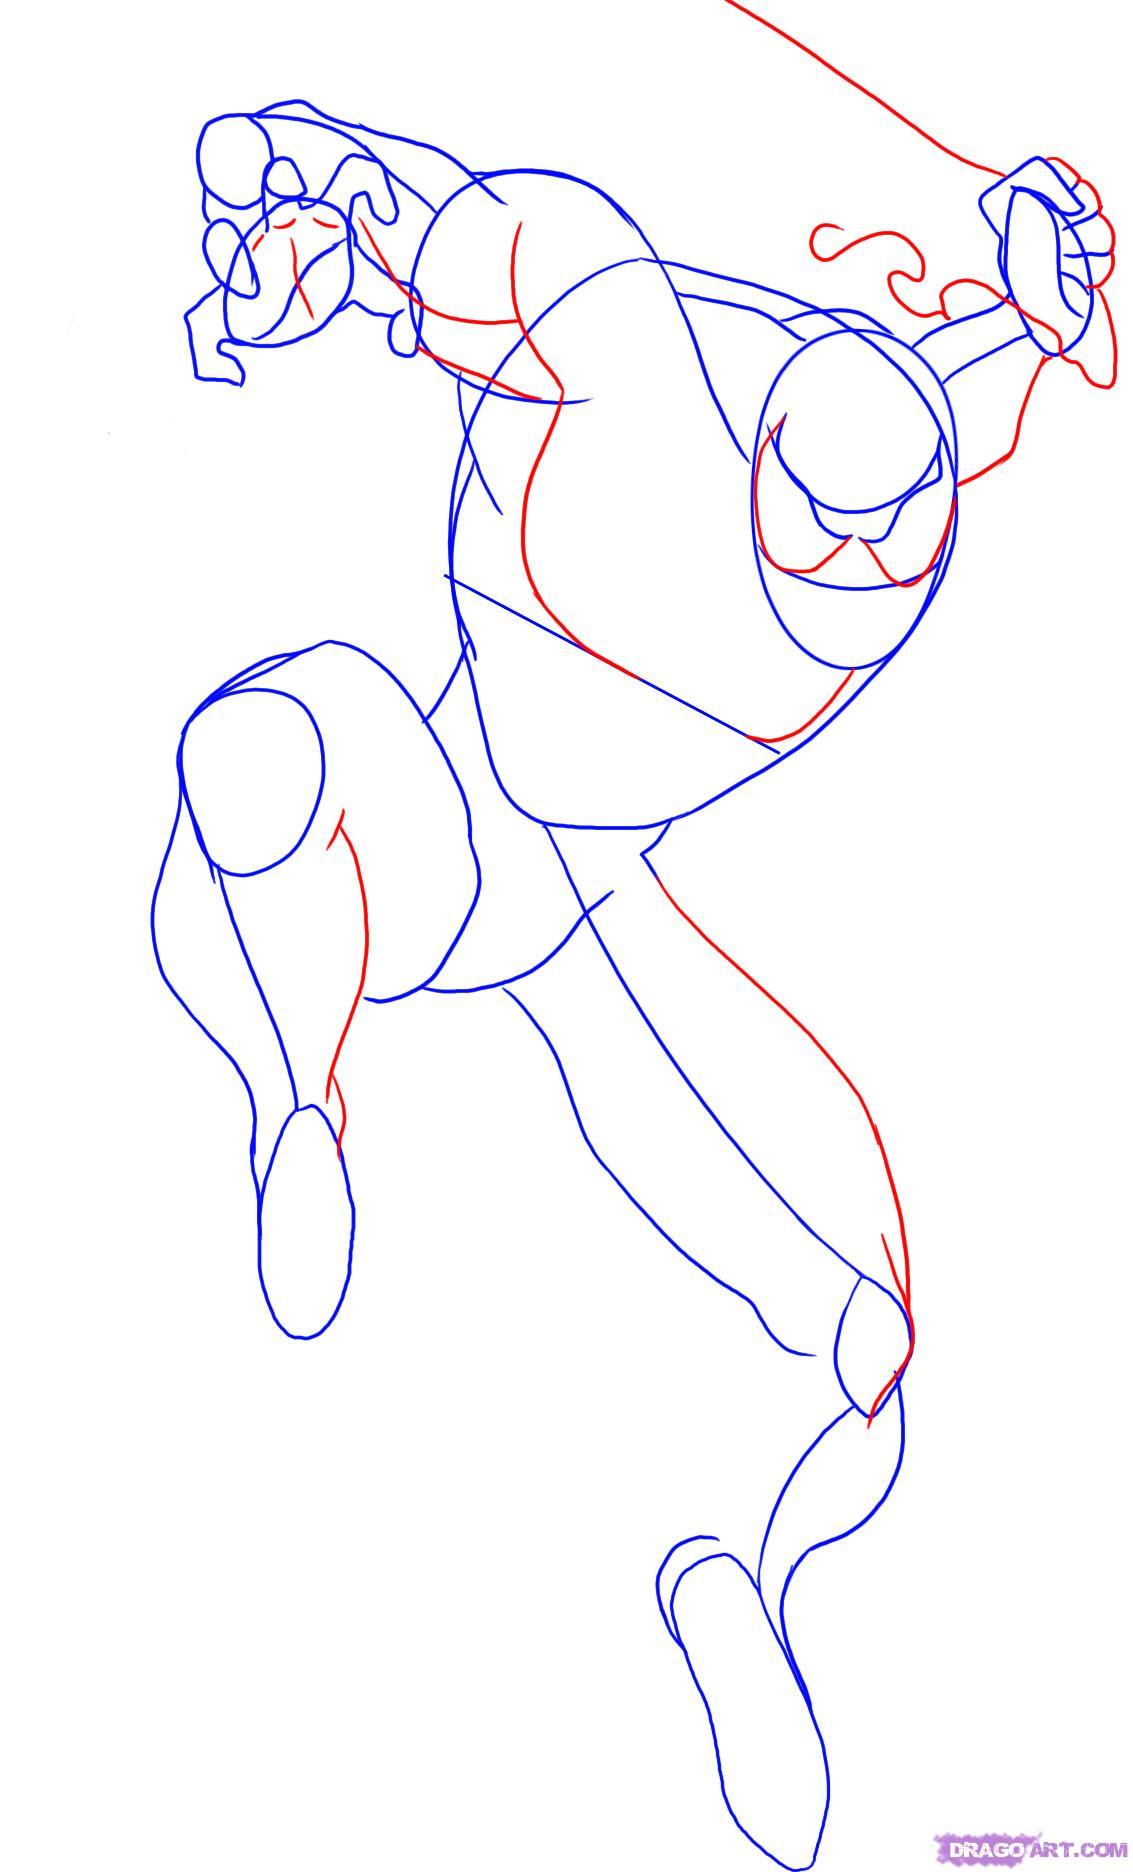 Drawn spider step by step Step Draw man 3 to